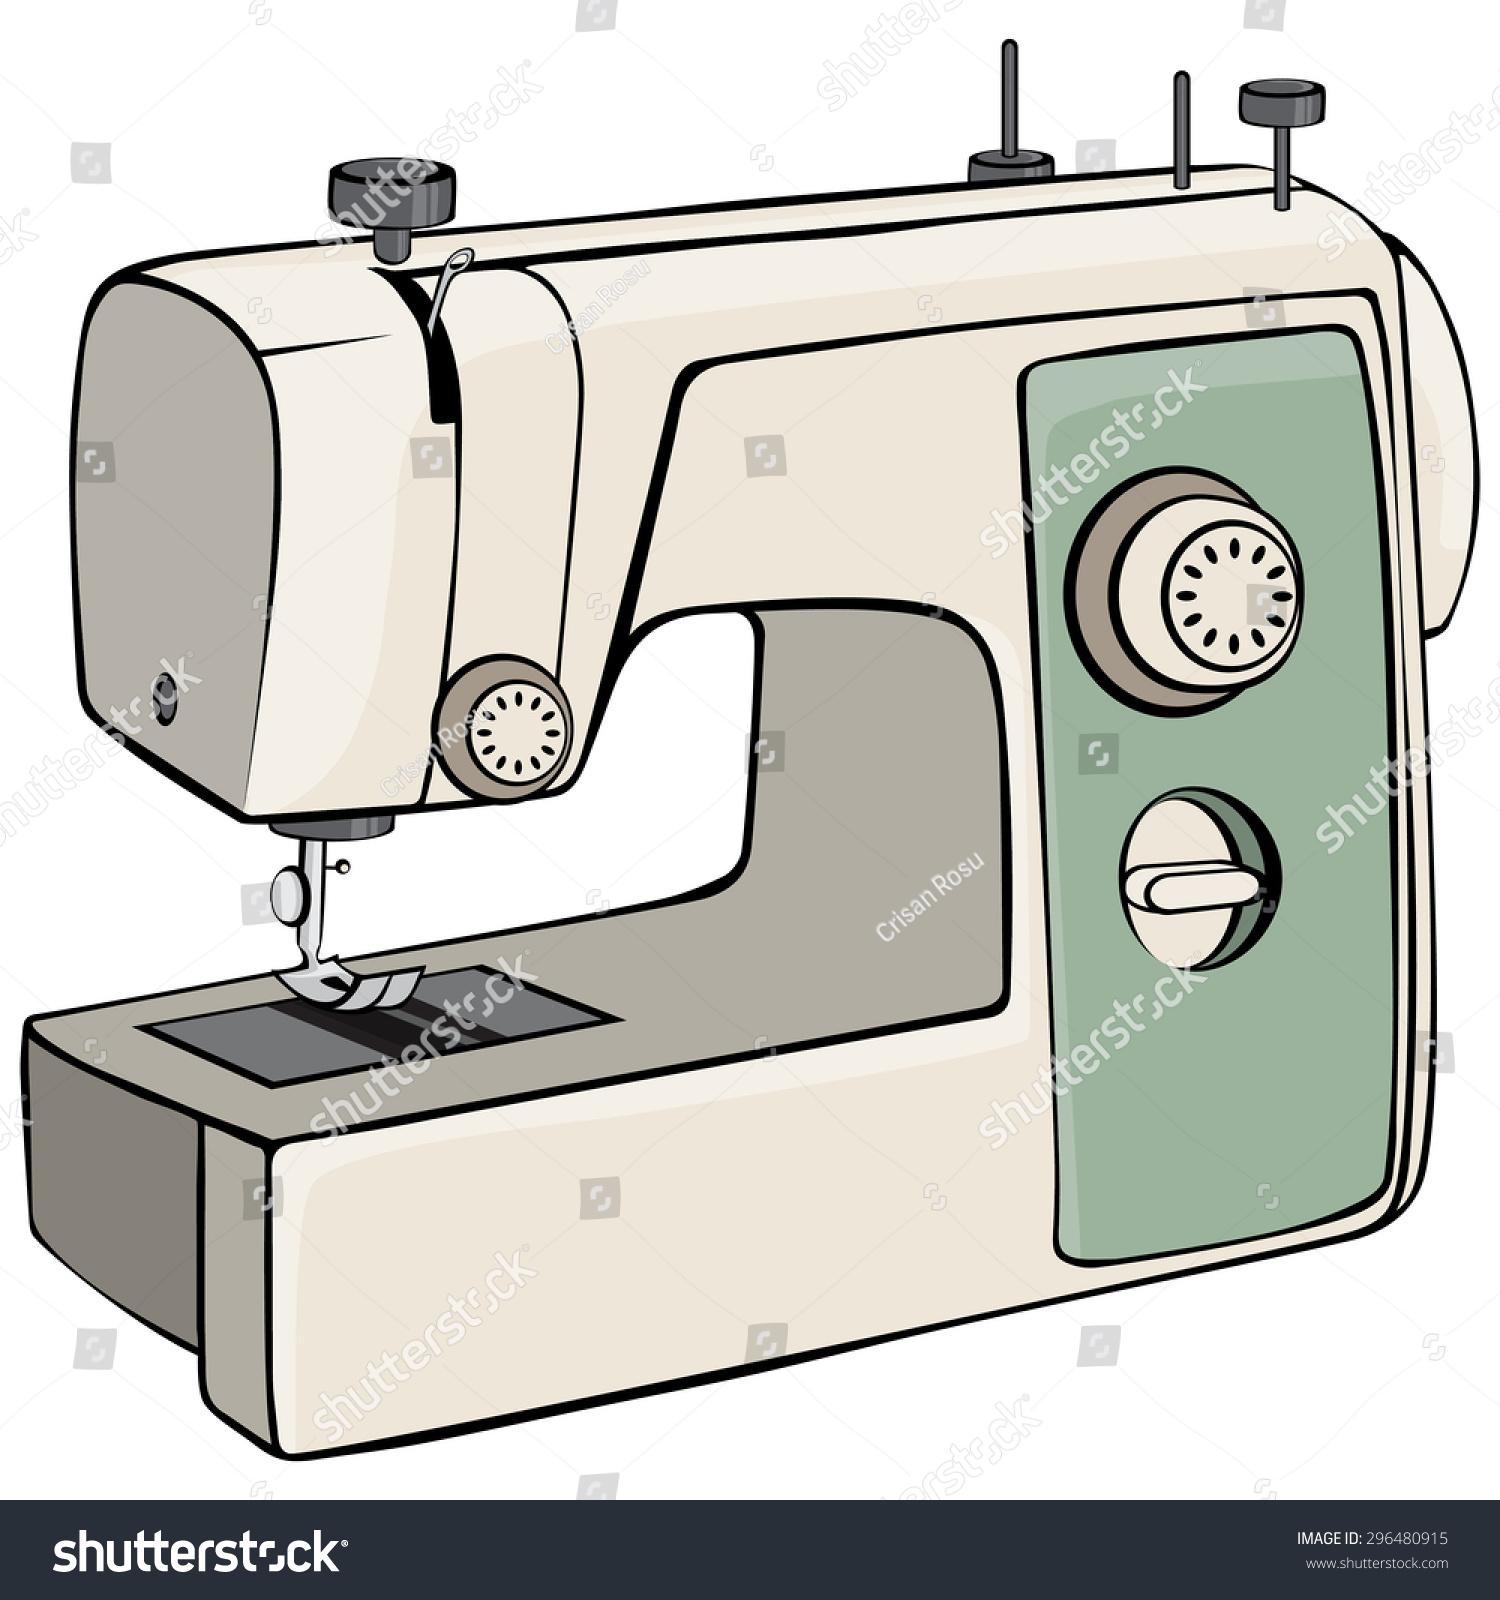 Vector Illustration Sewing Machine Cartoon Concept Stock